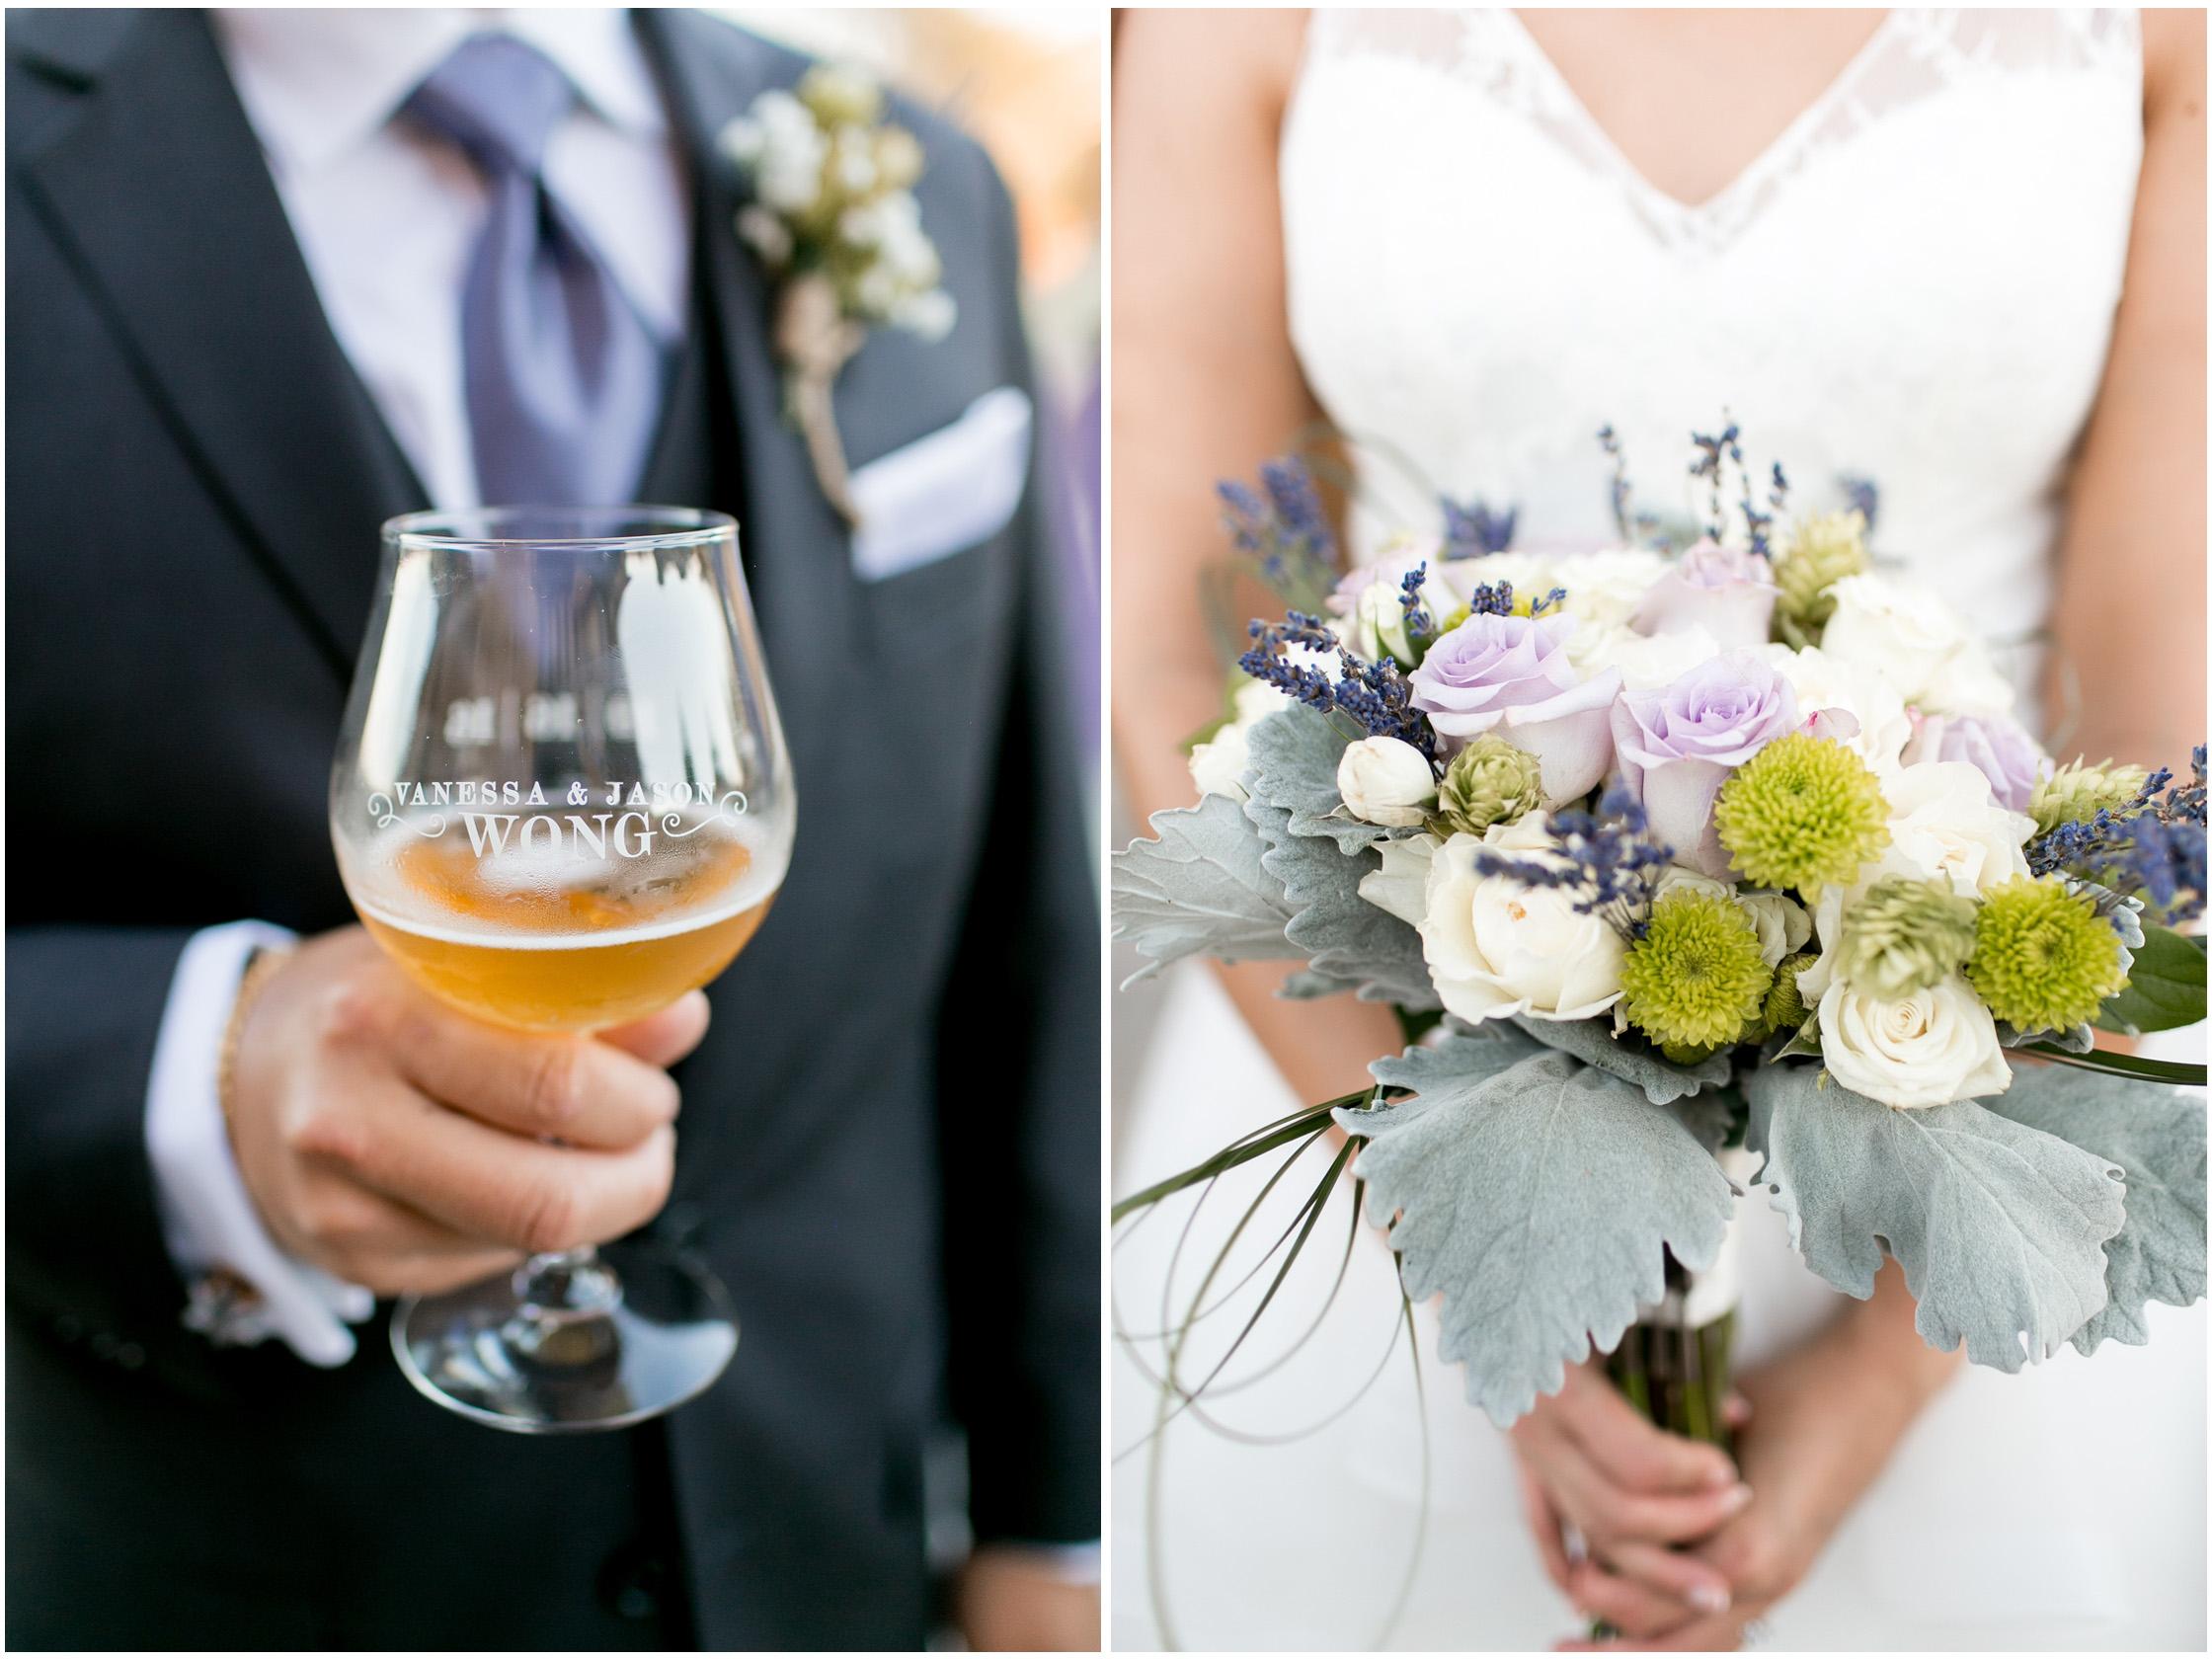 berry barn wedding details - 01